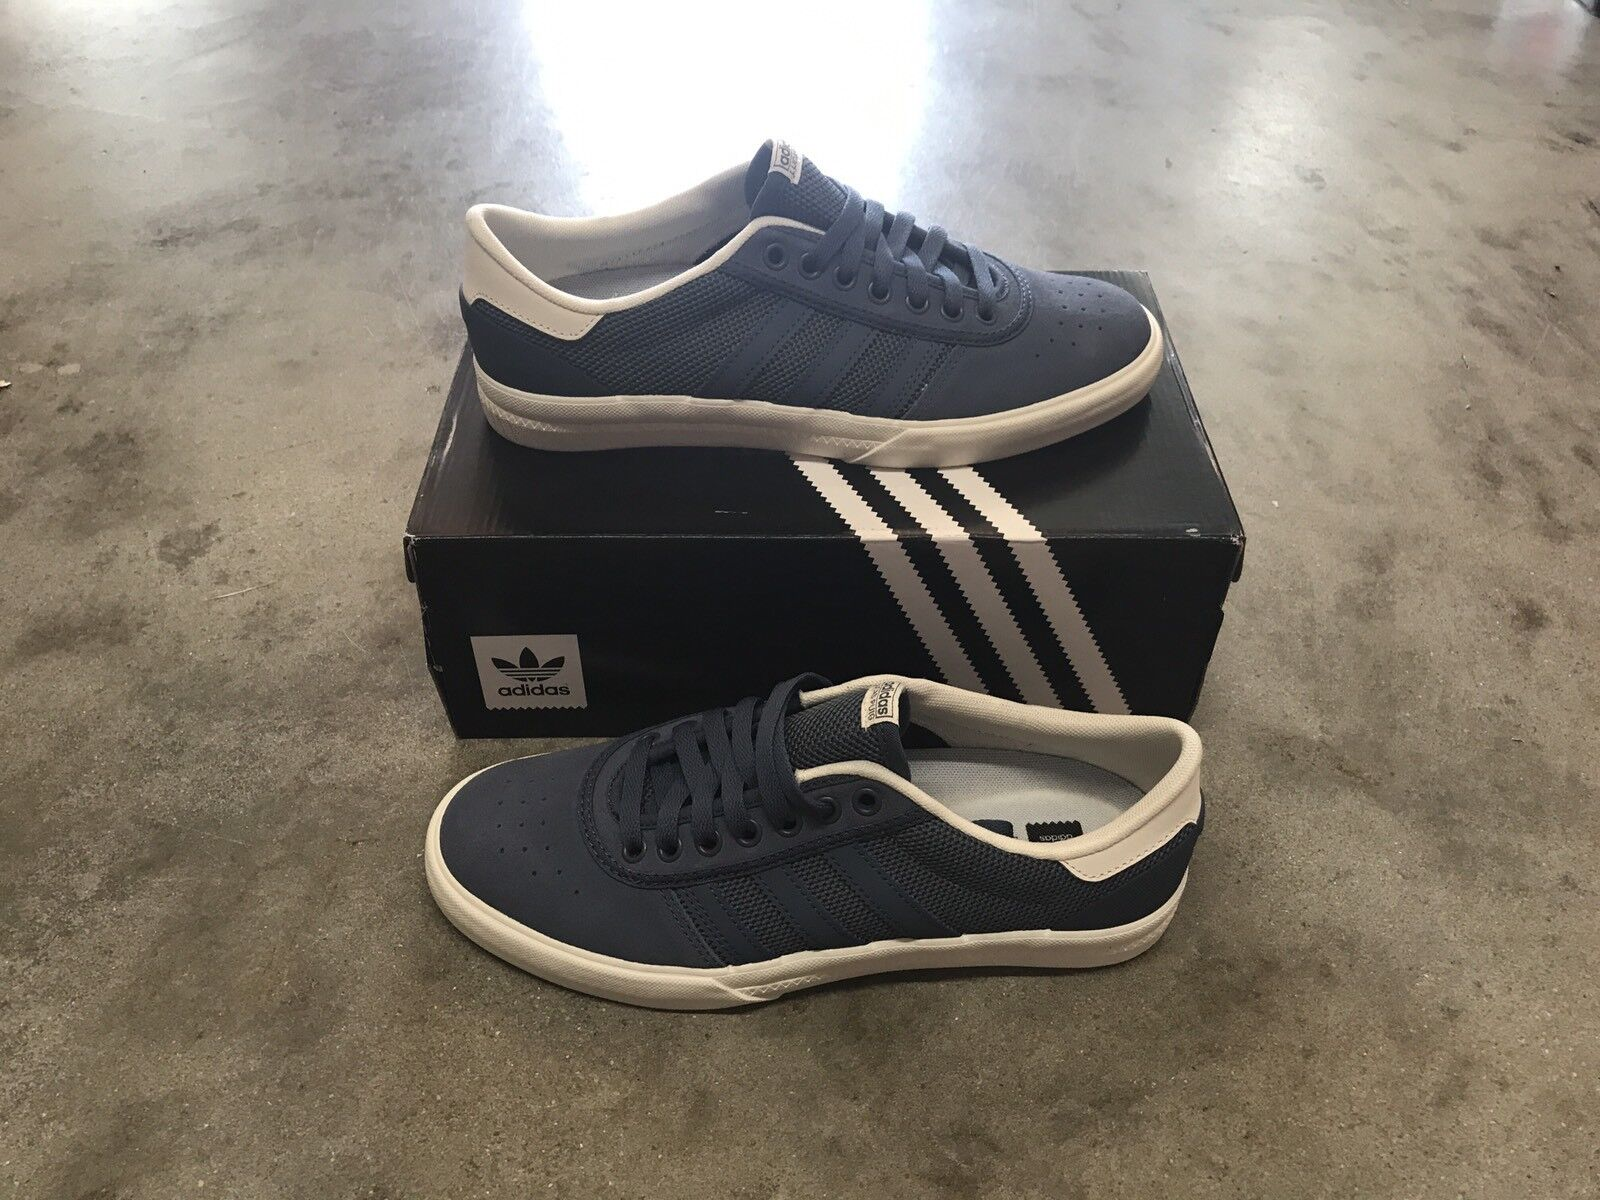 Adidas Lucas Premiere (Tecink/Tecink/Cwhite) Mens Skateboarding Shoes